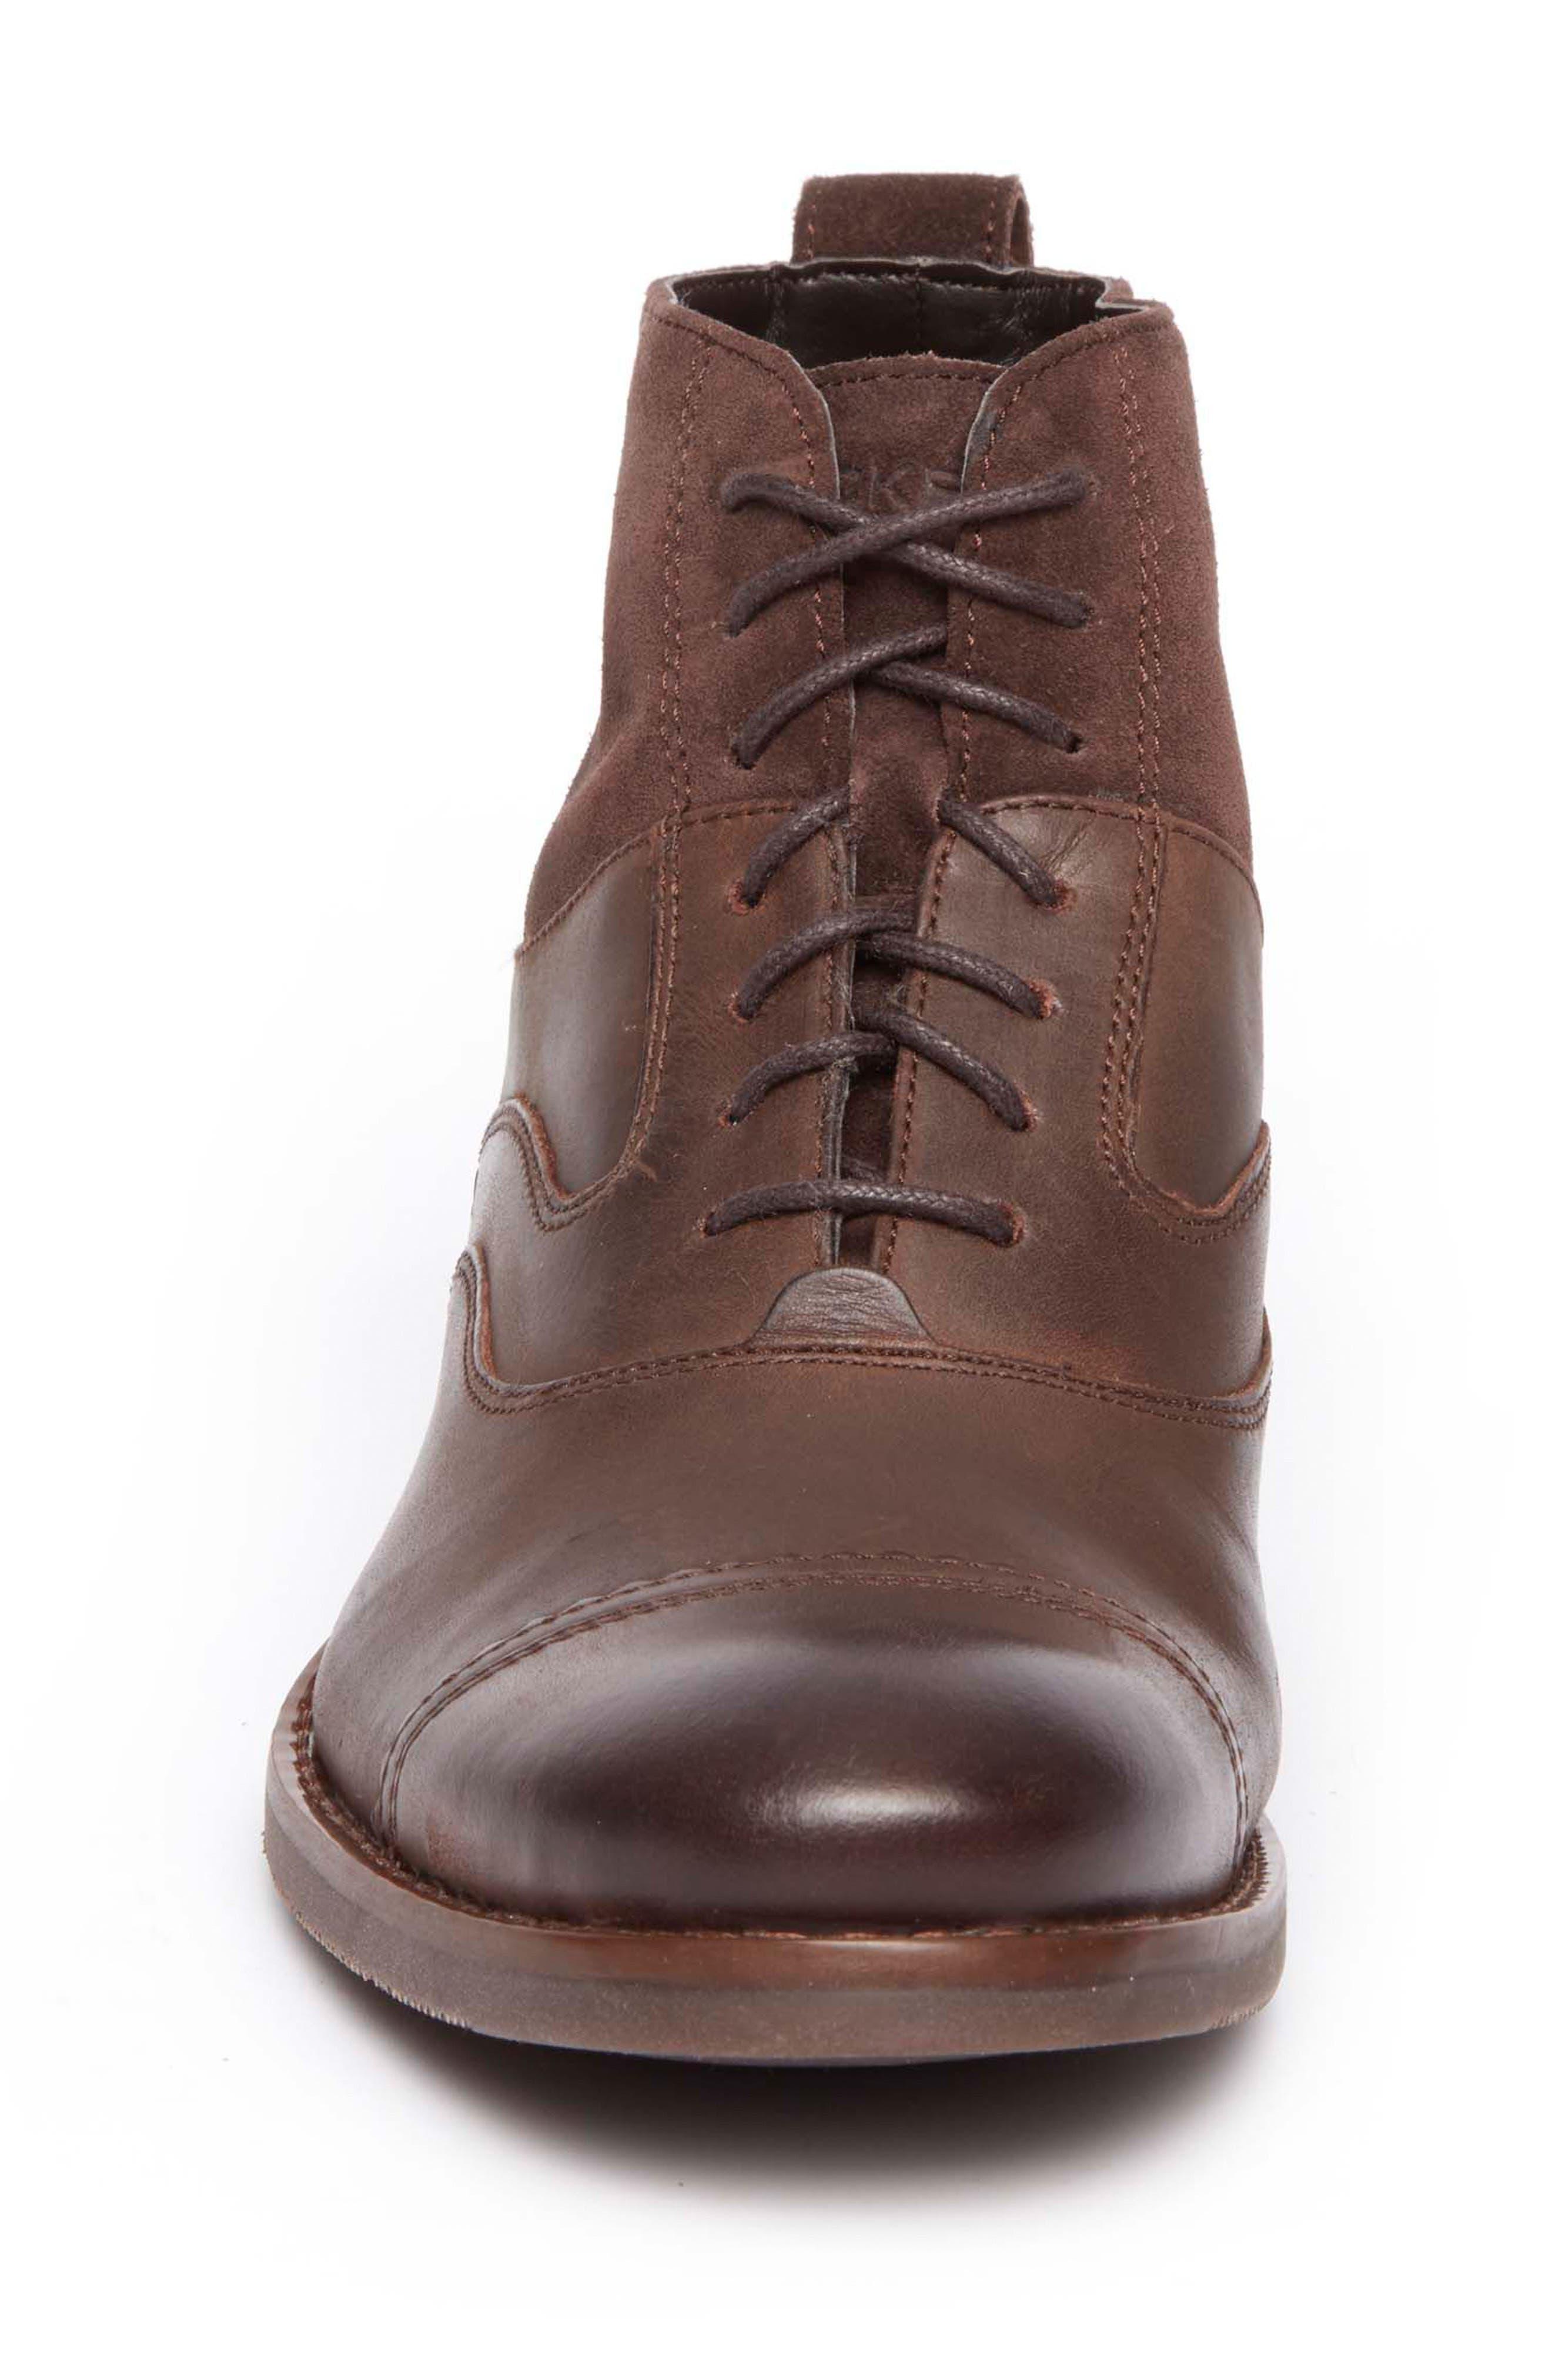 Wynstin Cap Toe Boot,                             Alternate thumbnail 4, color,                             Dark Chocolate Leather